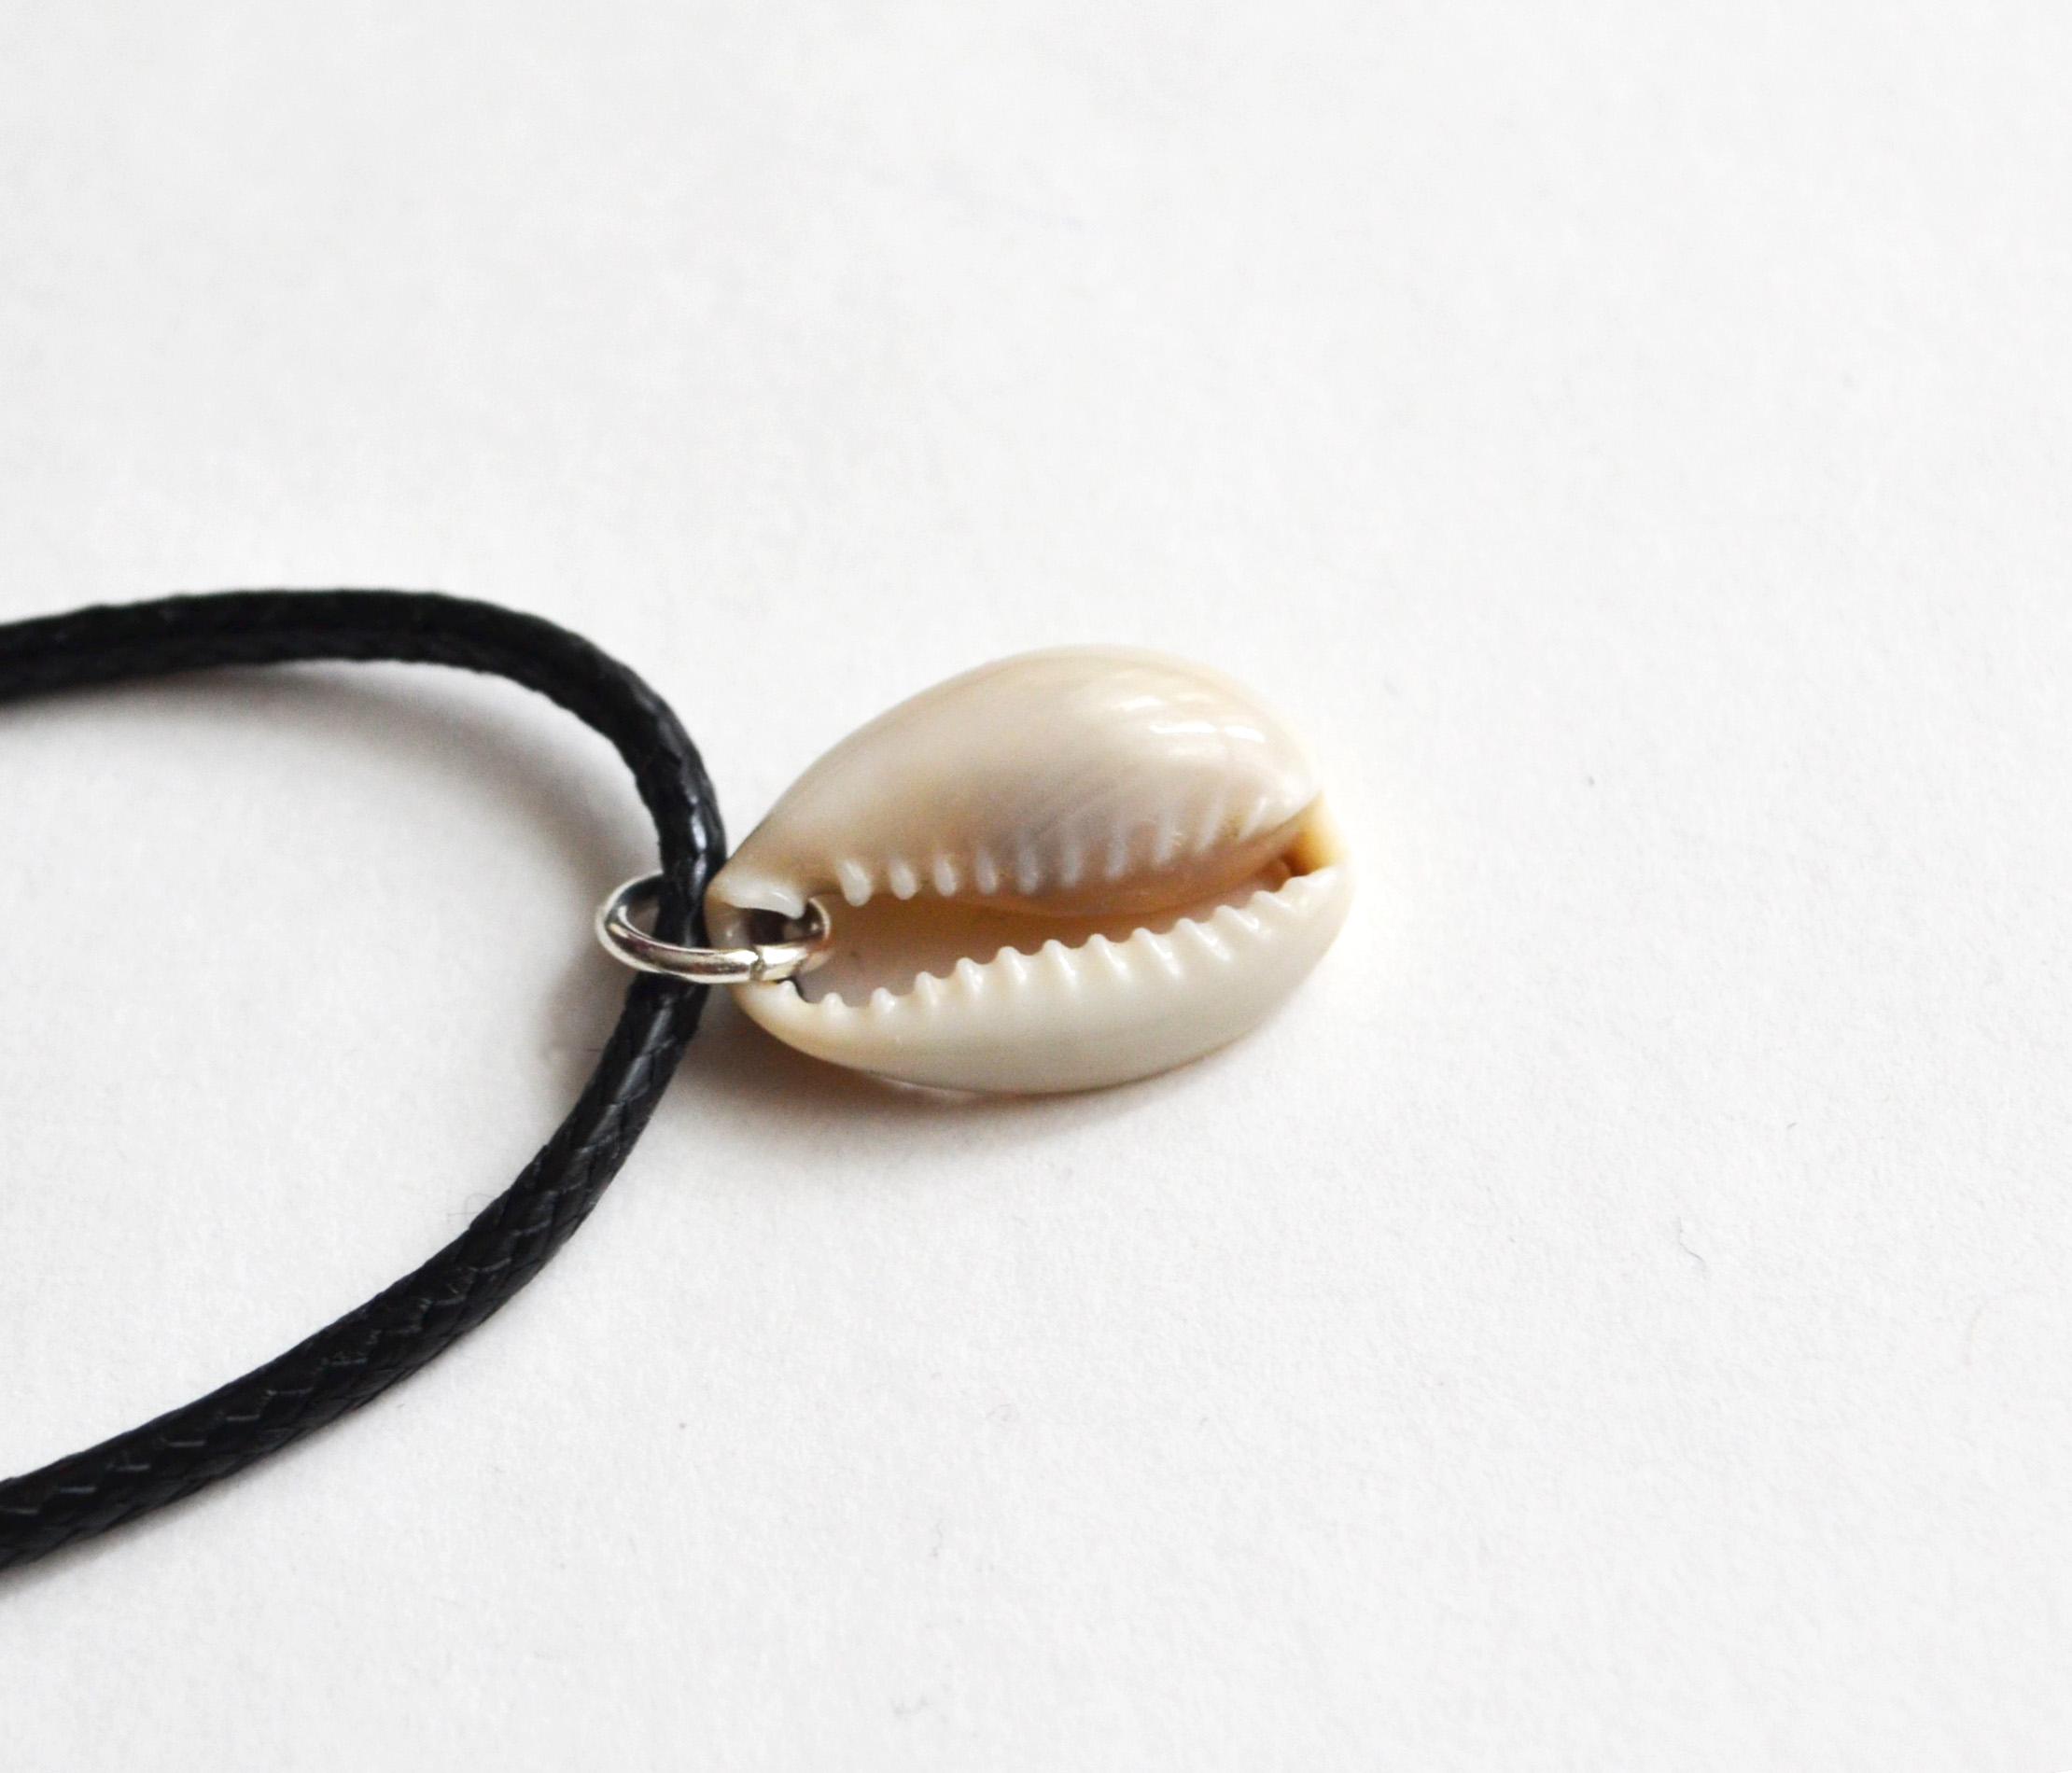 712f798b46815 Cowrie Shell Choker, Shell Necklace, Shell Choker, Cowrie Shells, Choker,  Summer Necklace, Beach Jewelry